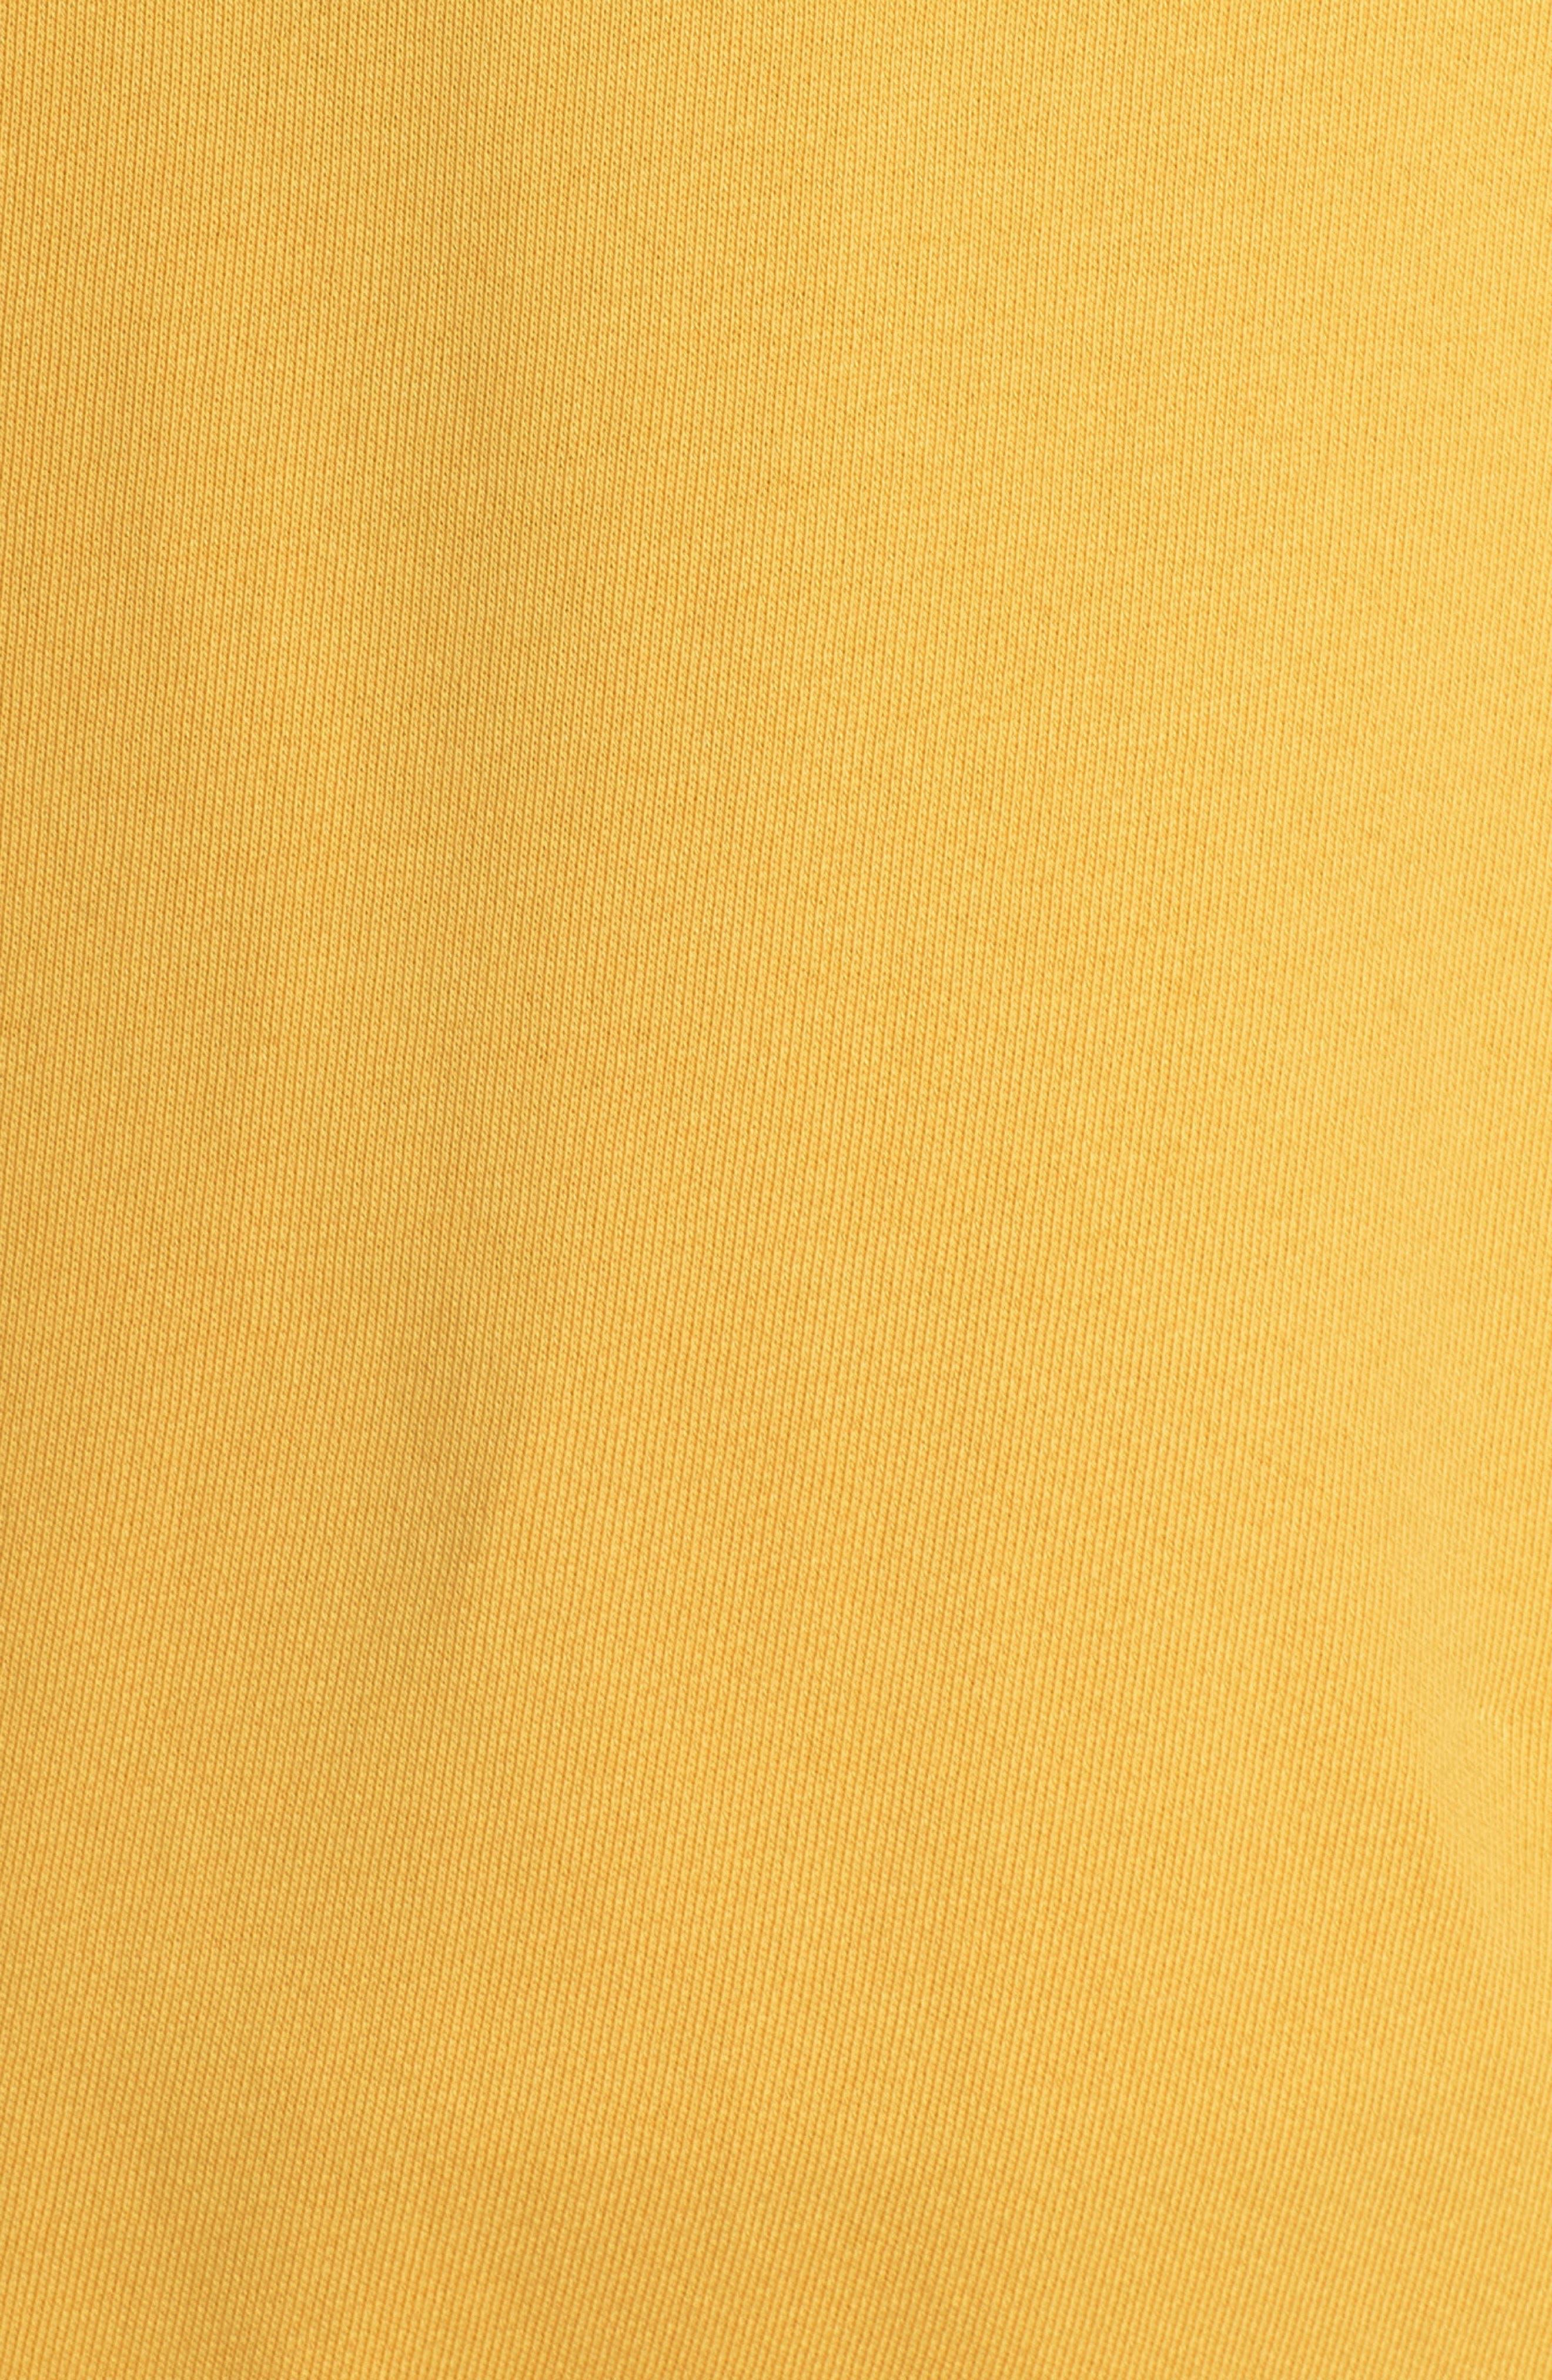 Raglan Sleeve Hoodie,                             Alternate thumbnail 6, color,                             GOLDEN SUN